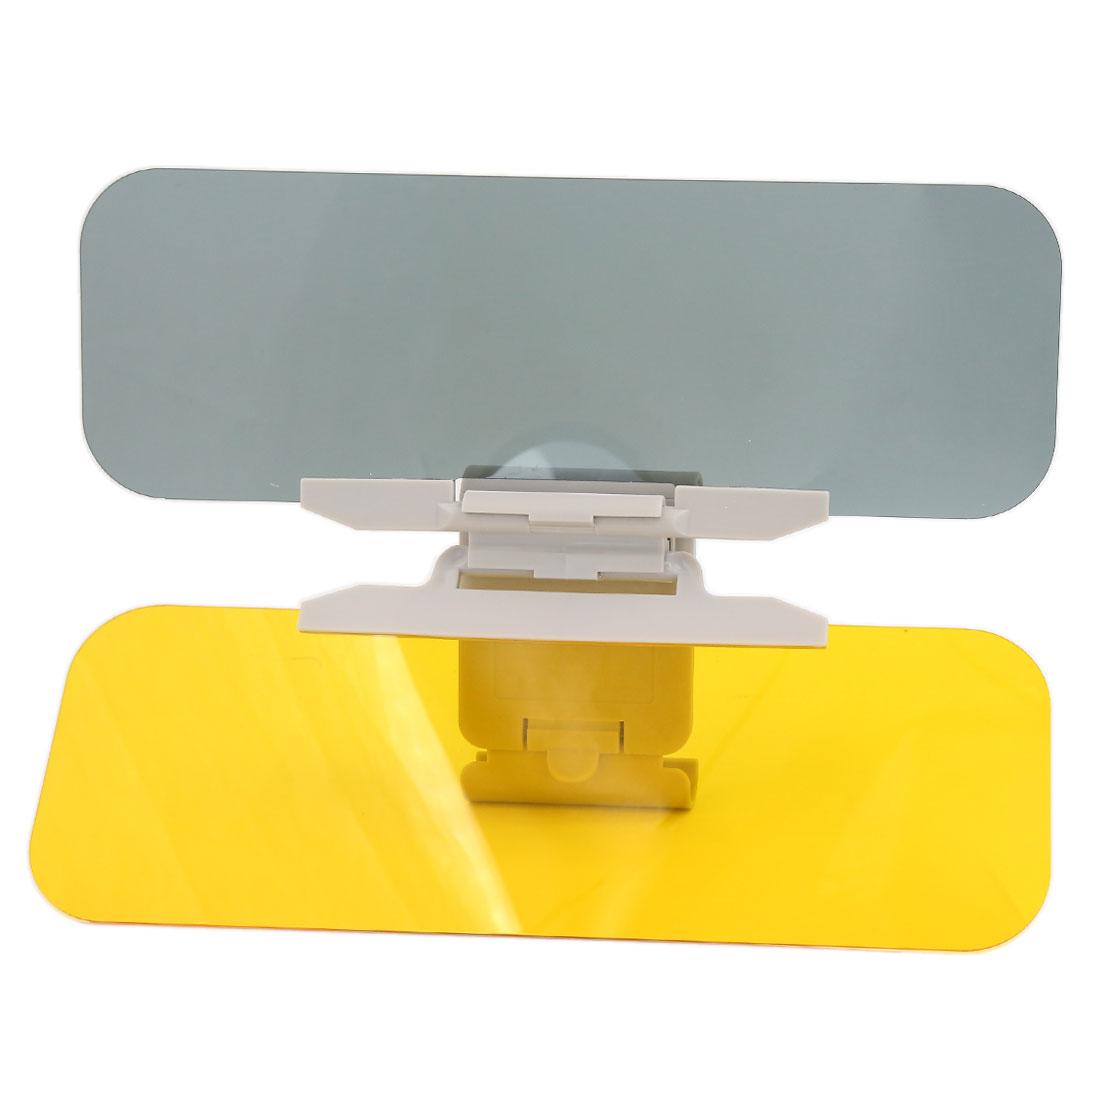 HD Anti-Glare Universal Car Flip Down 2 in 1 Day Night Vision Shield Sun Visor